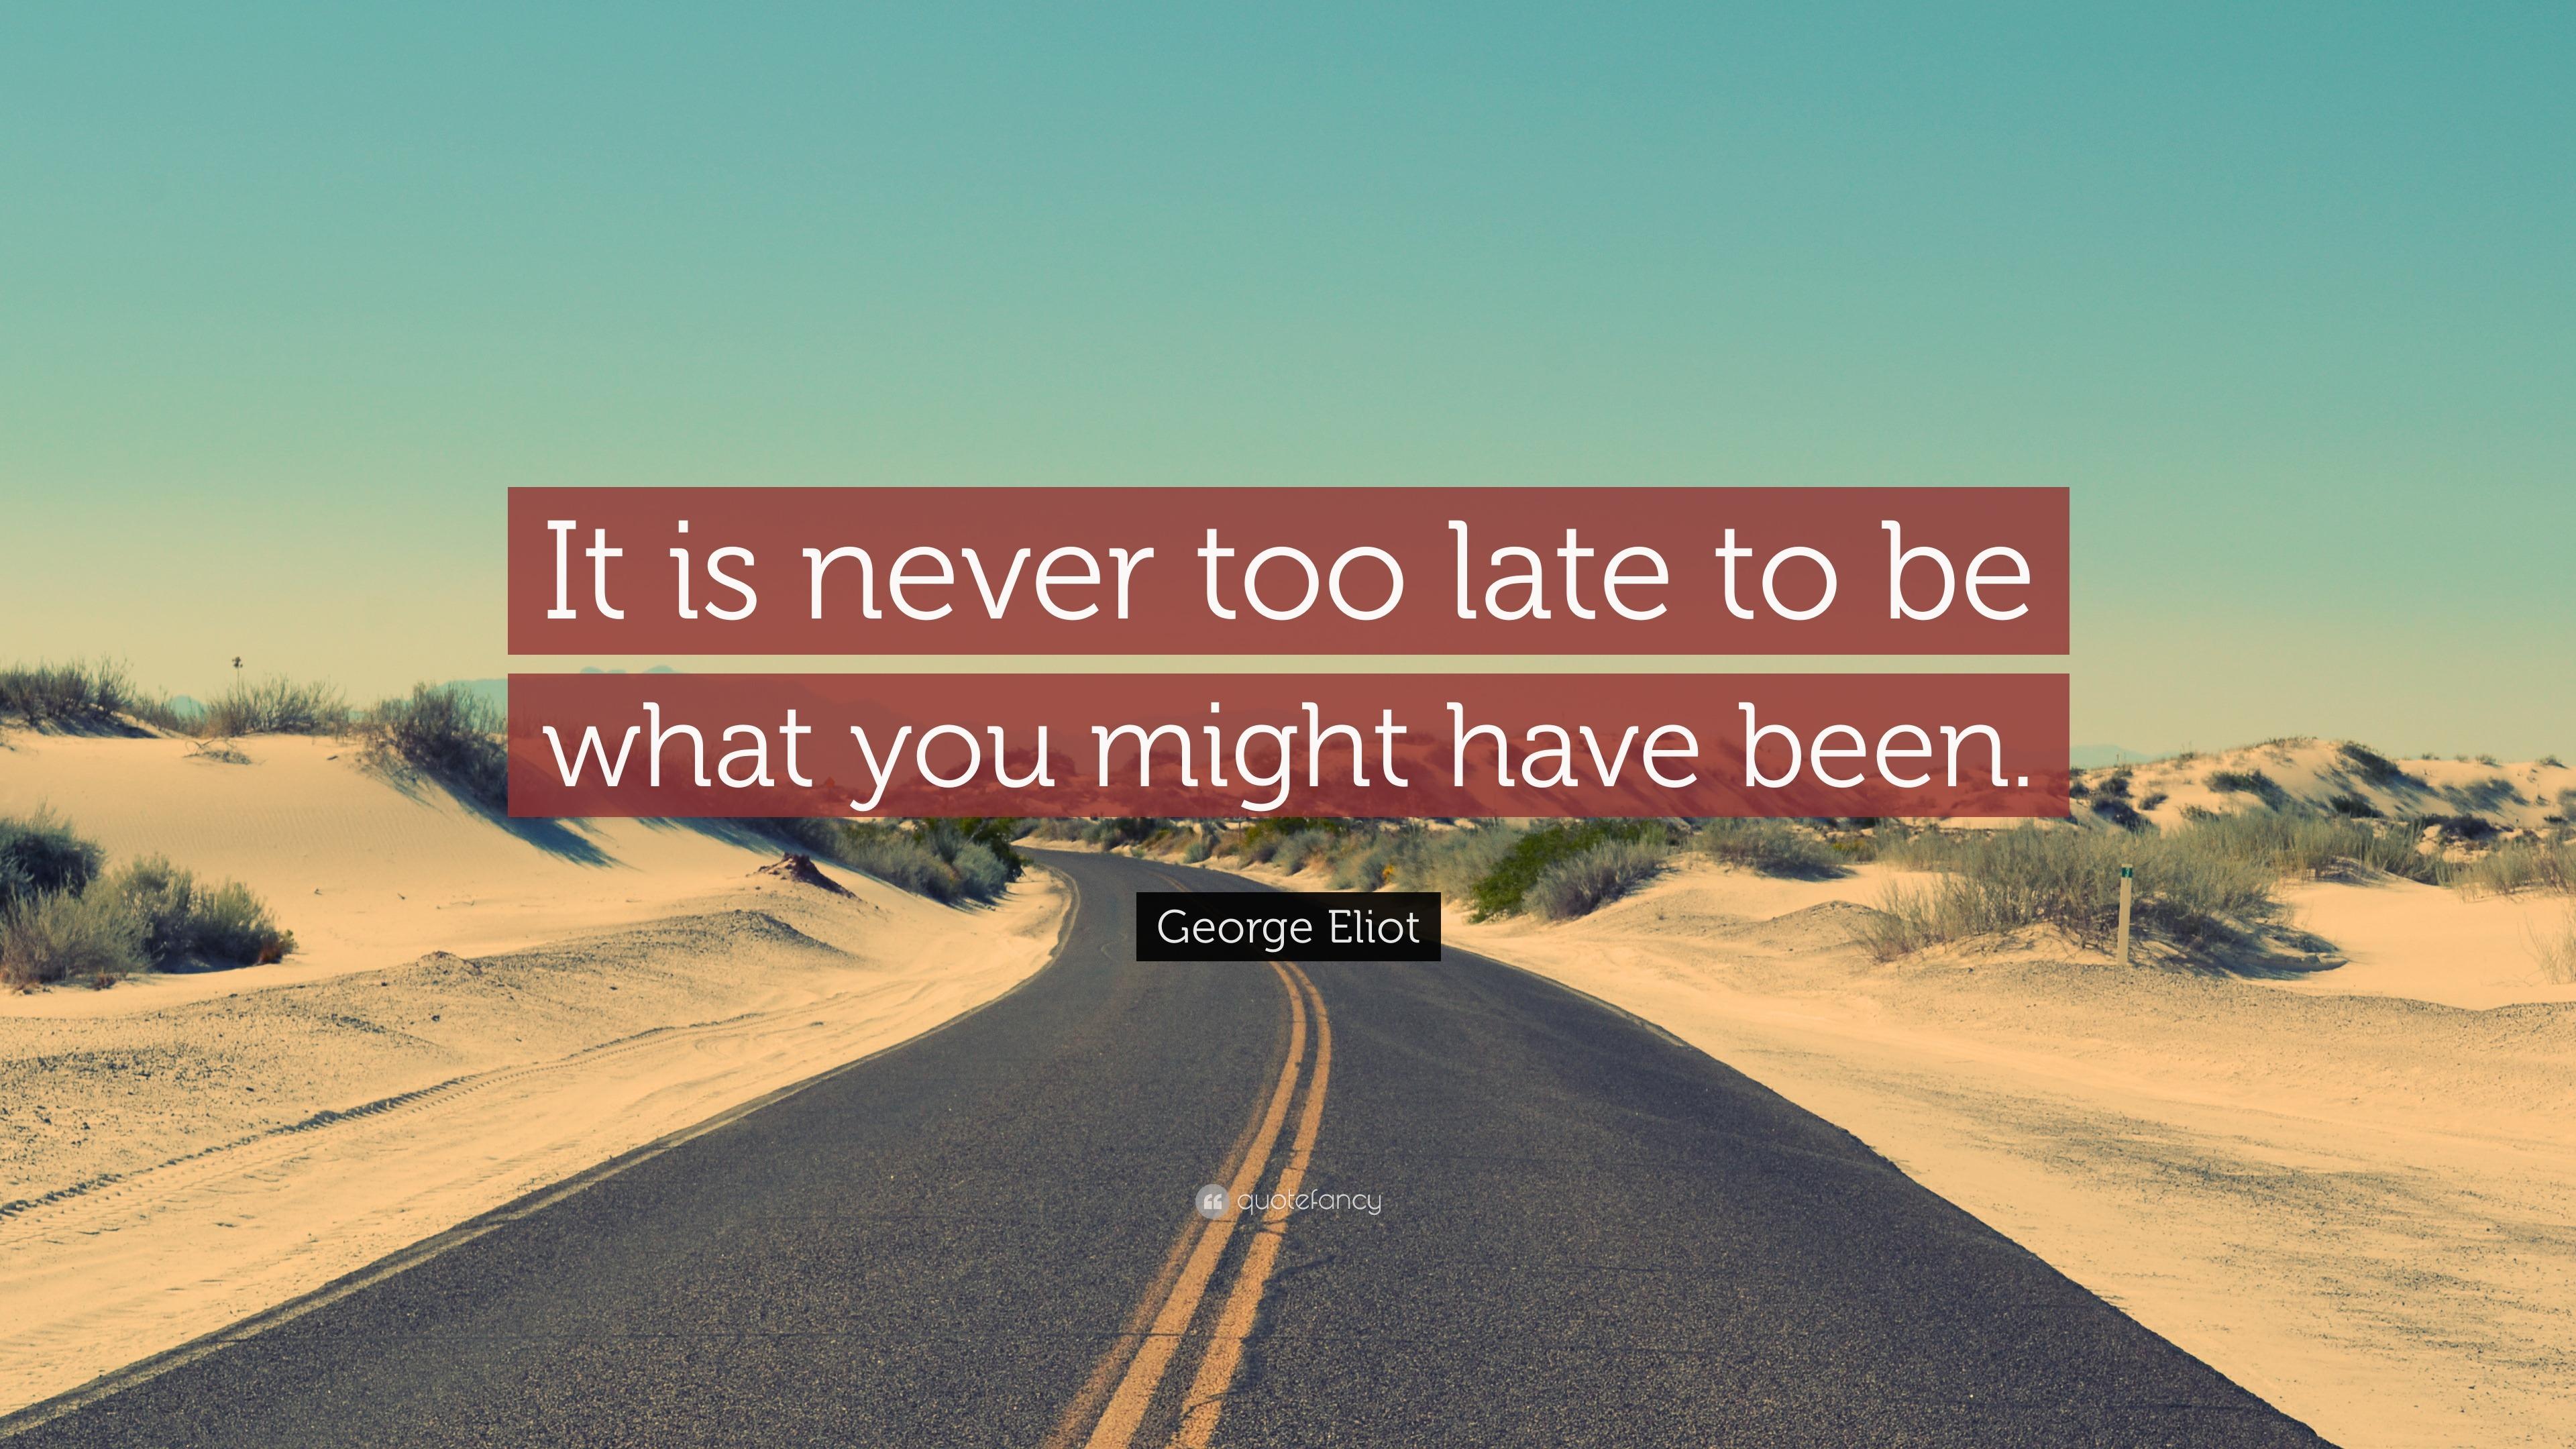 motivational bodybuilding quotes: